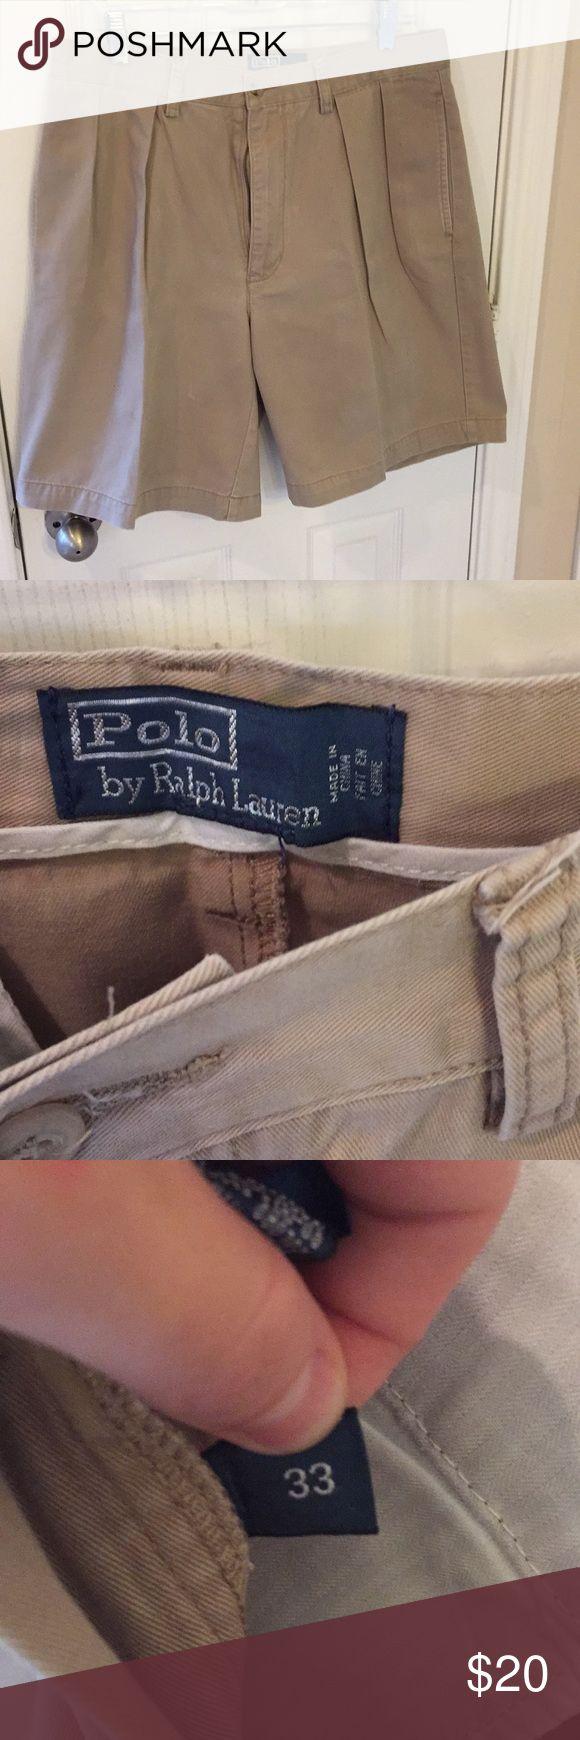 Ralph Lauren Polo men's khaki shorts size 33 Pleated front, khaki color, barely worn Polo by Ralph Lauren Shorts